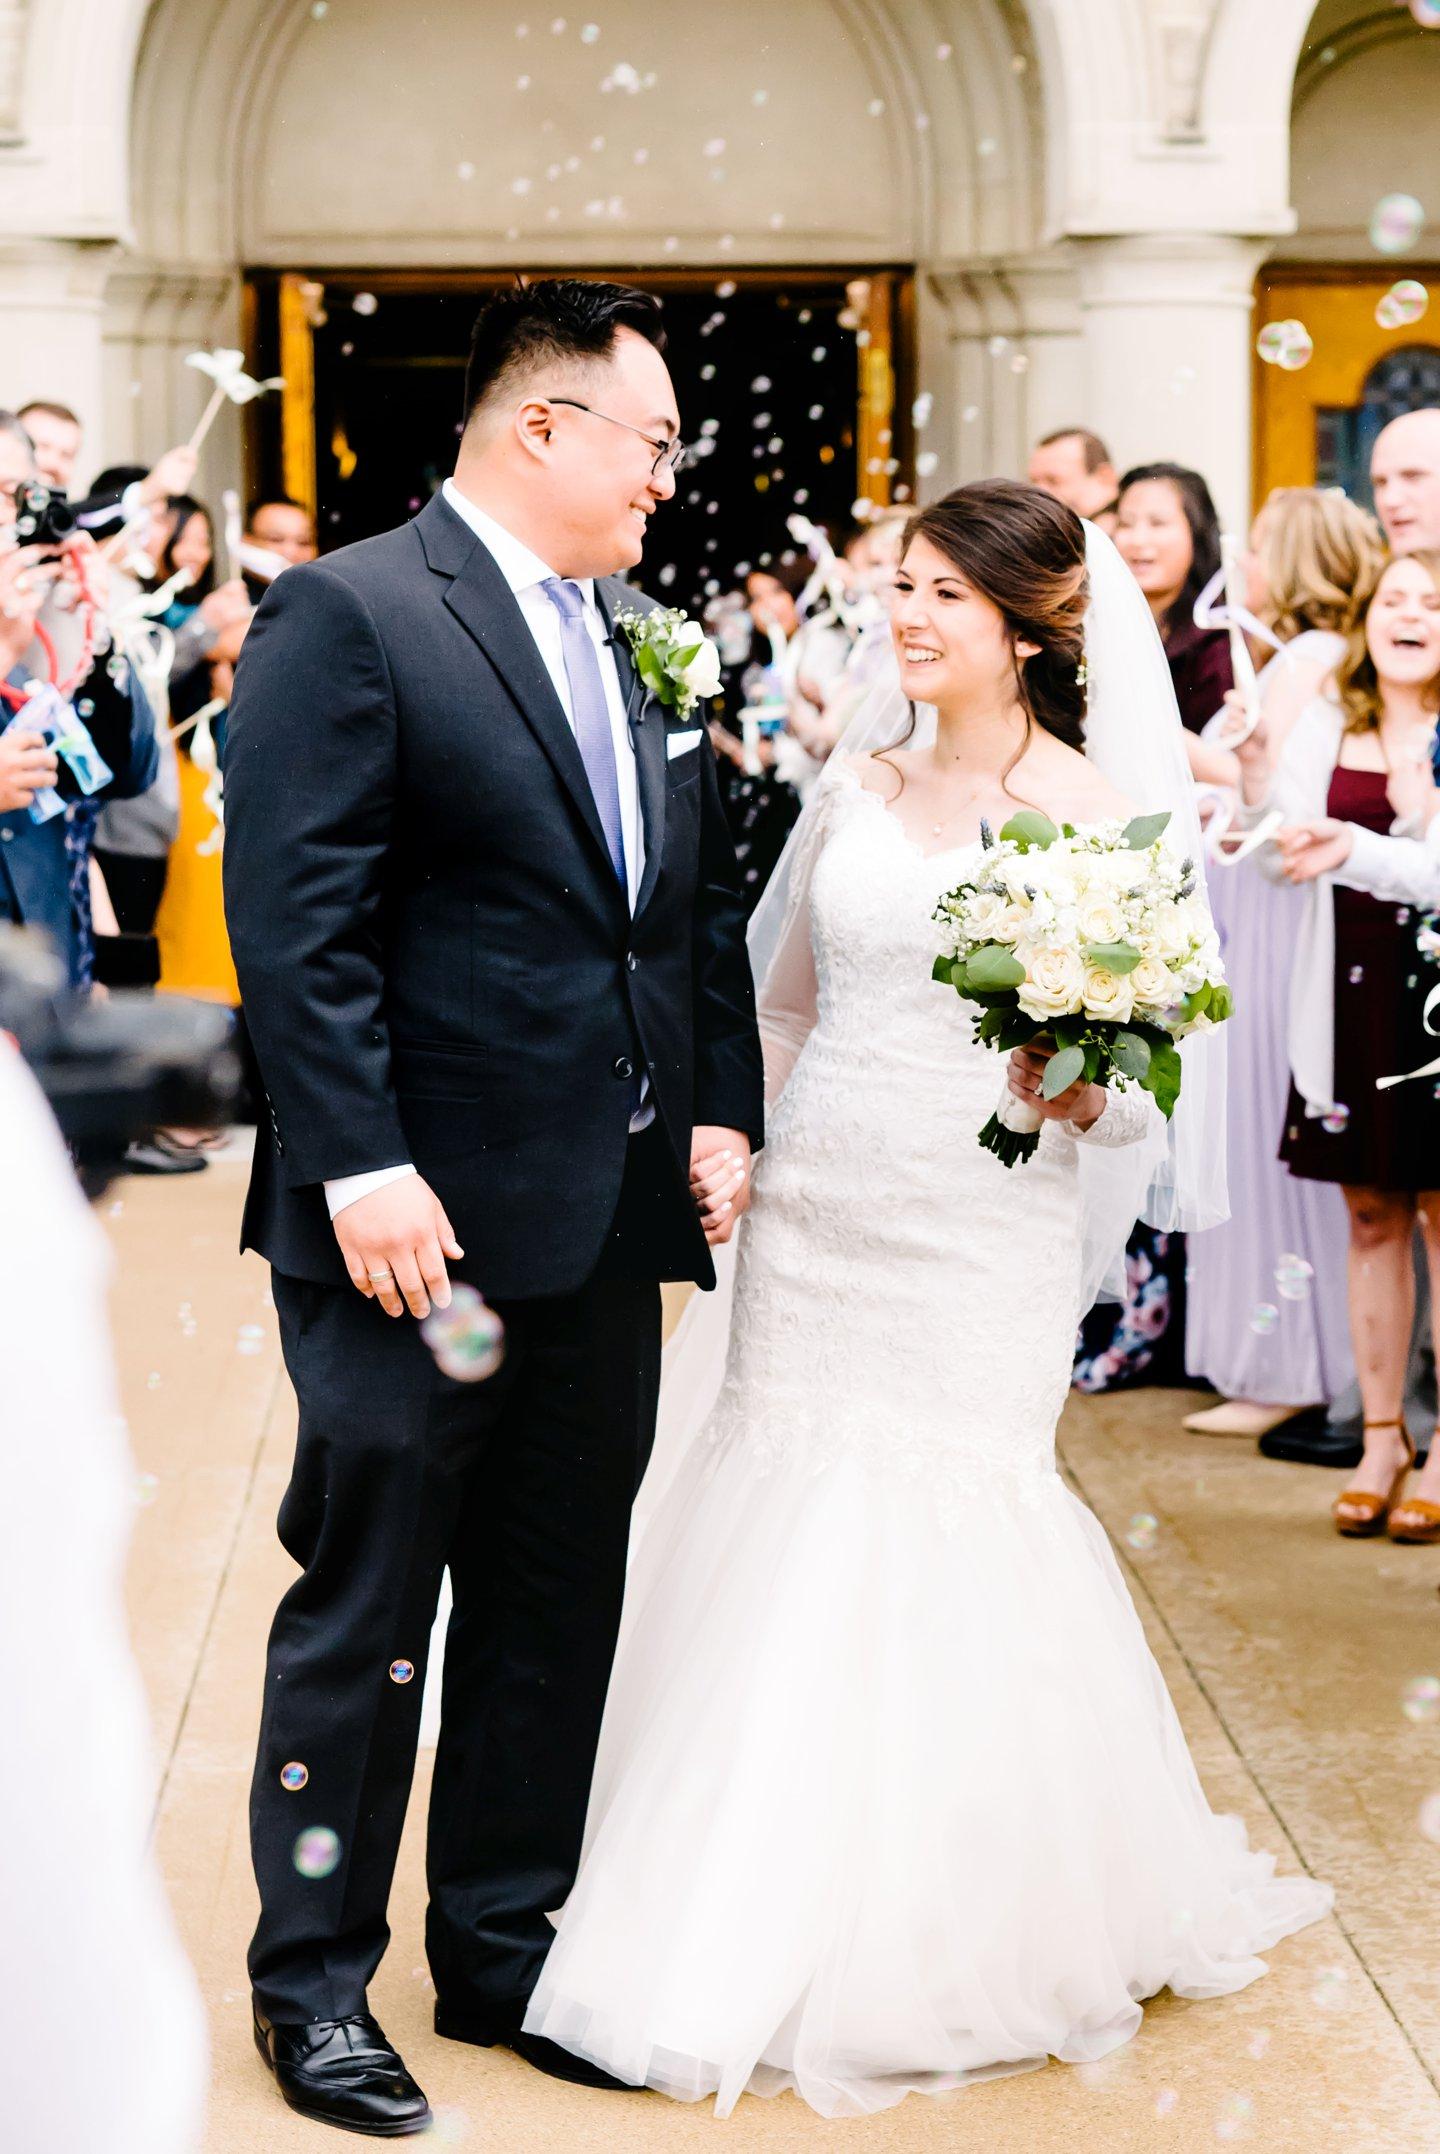 lake-geneva-fine-art-wedding-photographer-santos31